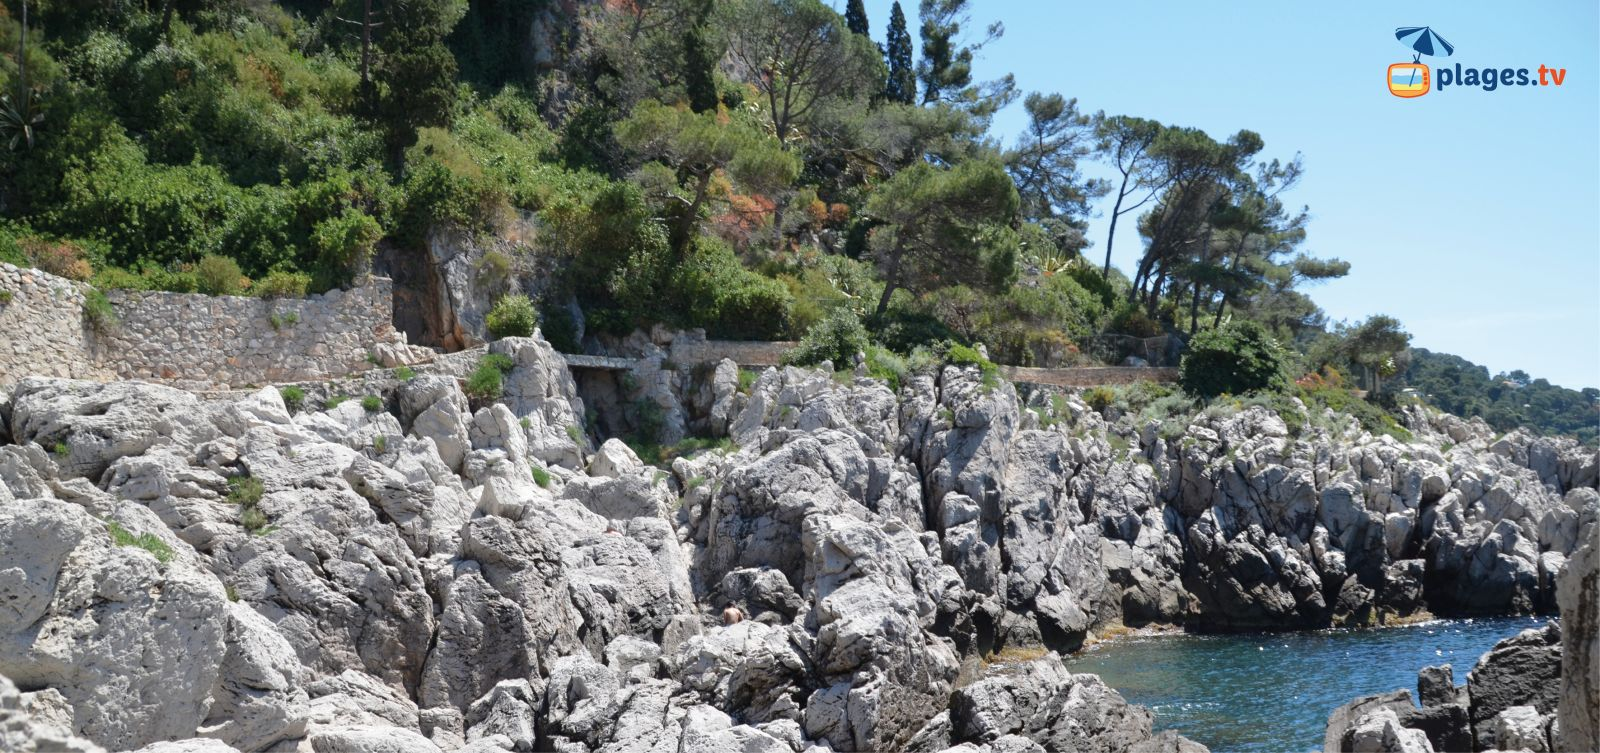 sentier du littoral du cap ferrat